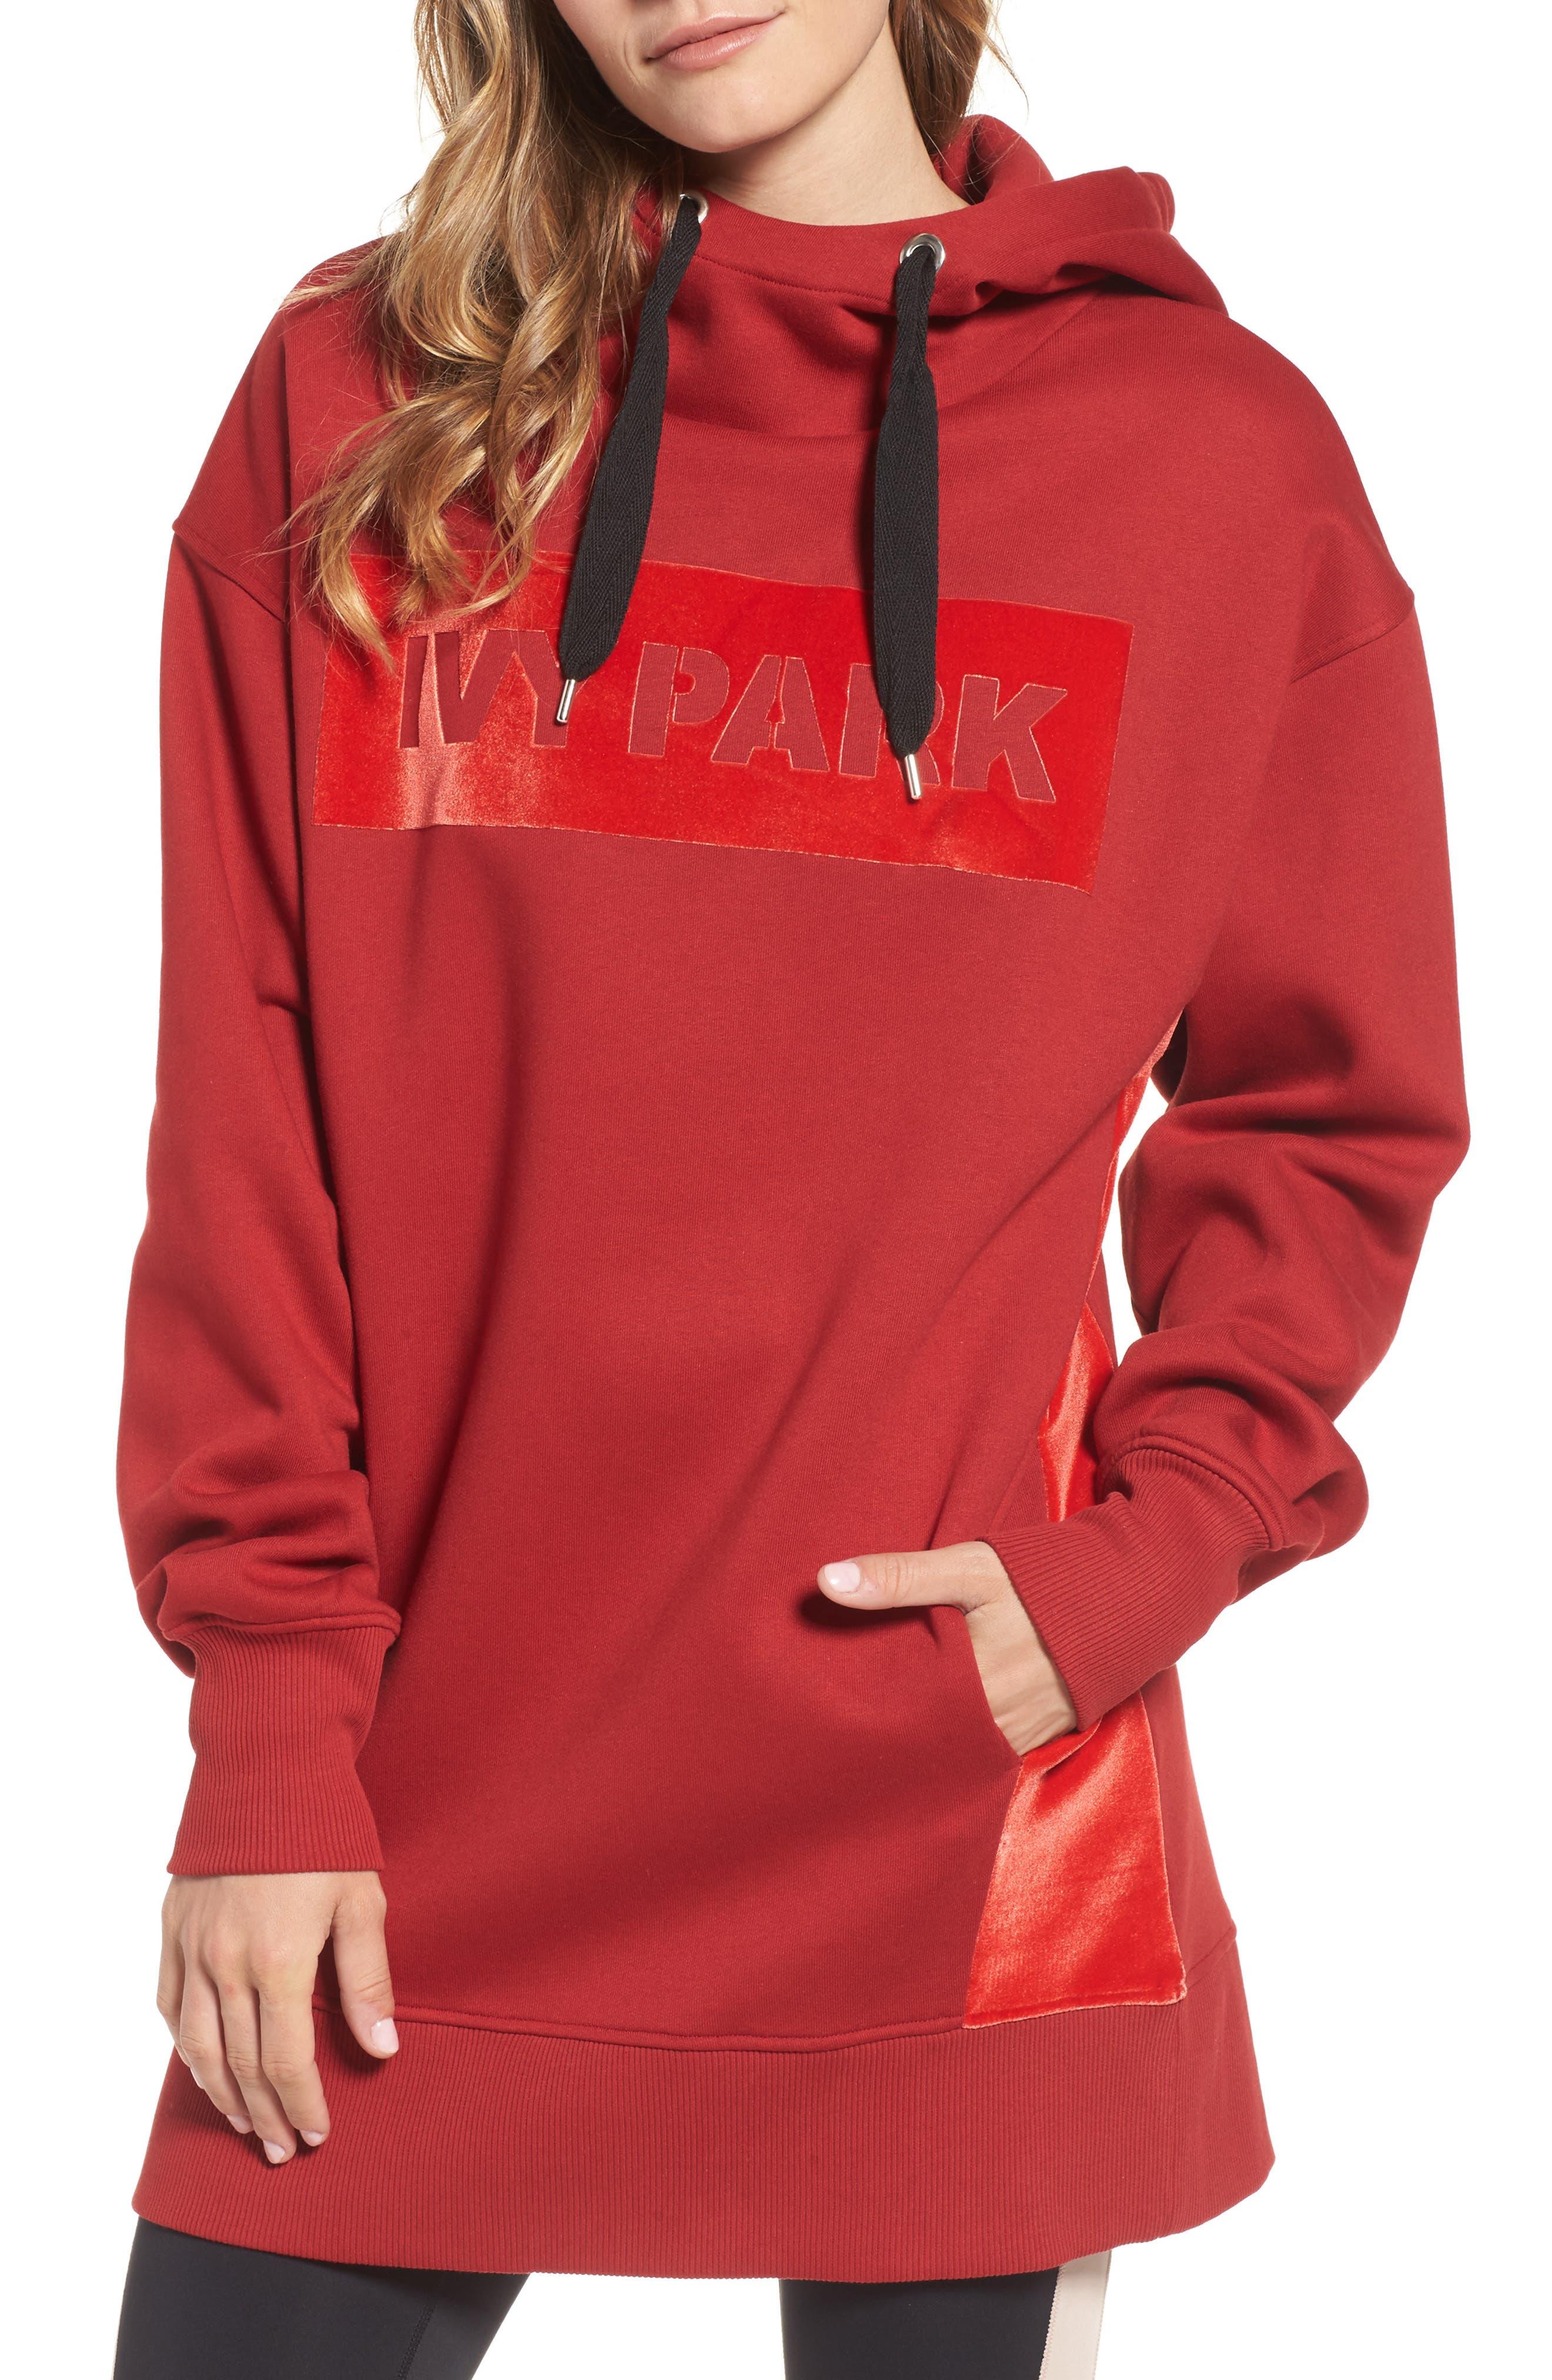 Red Sweatshirt Dress